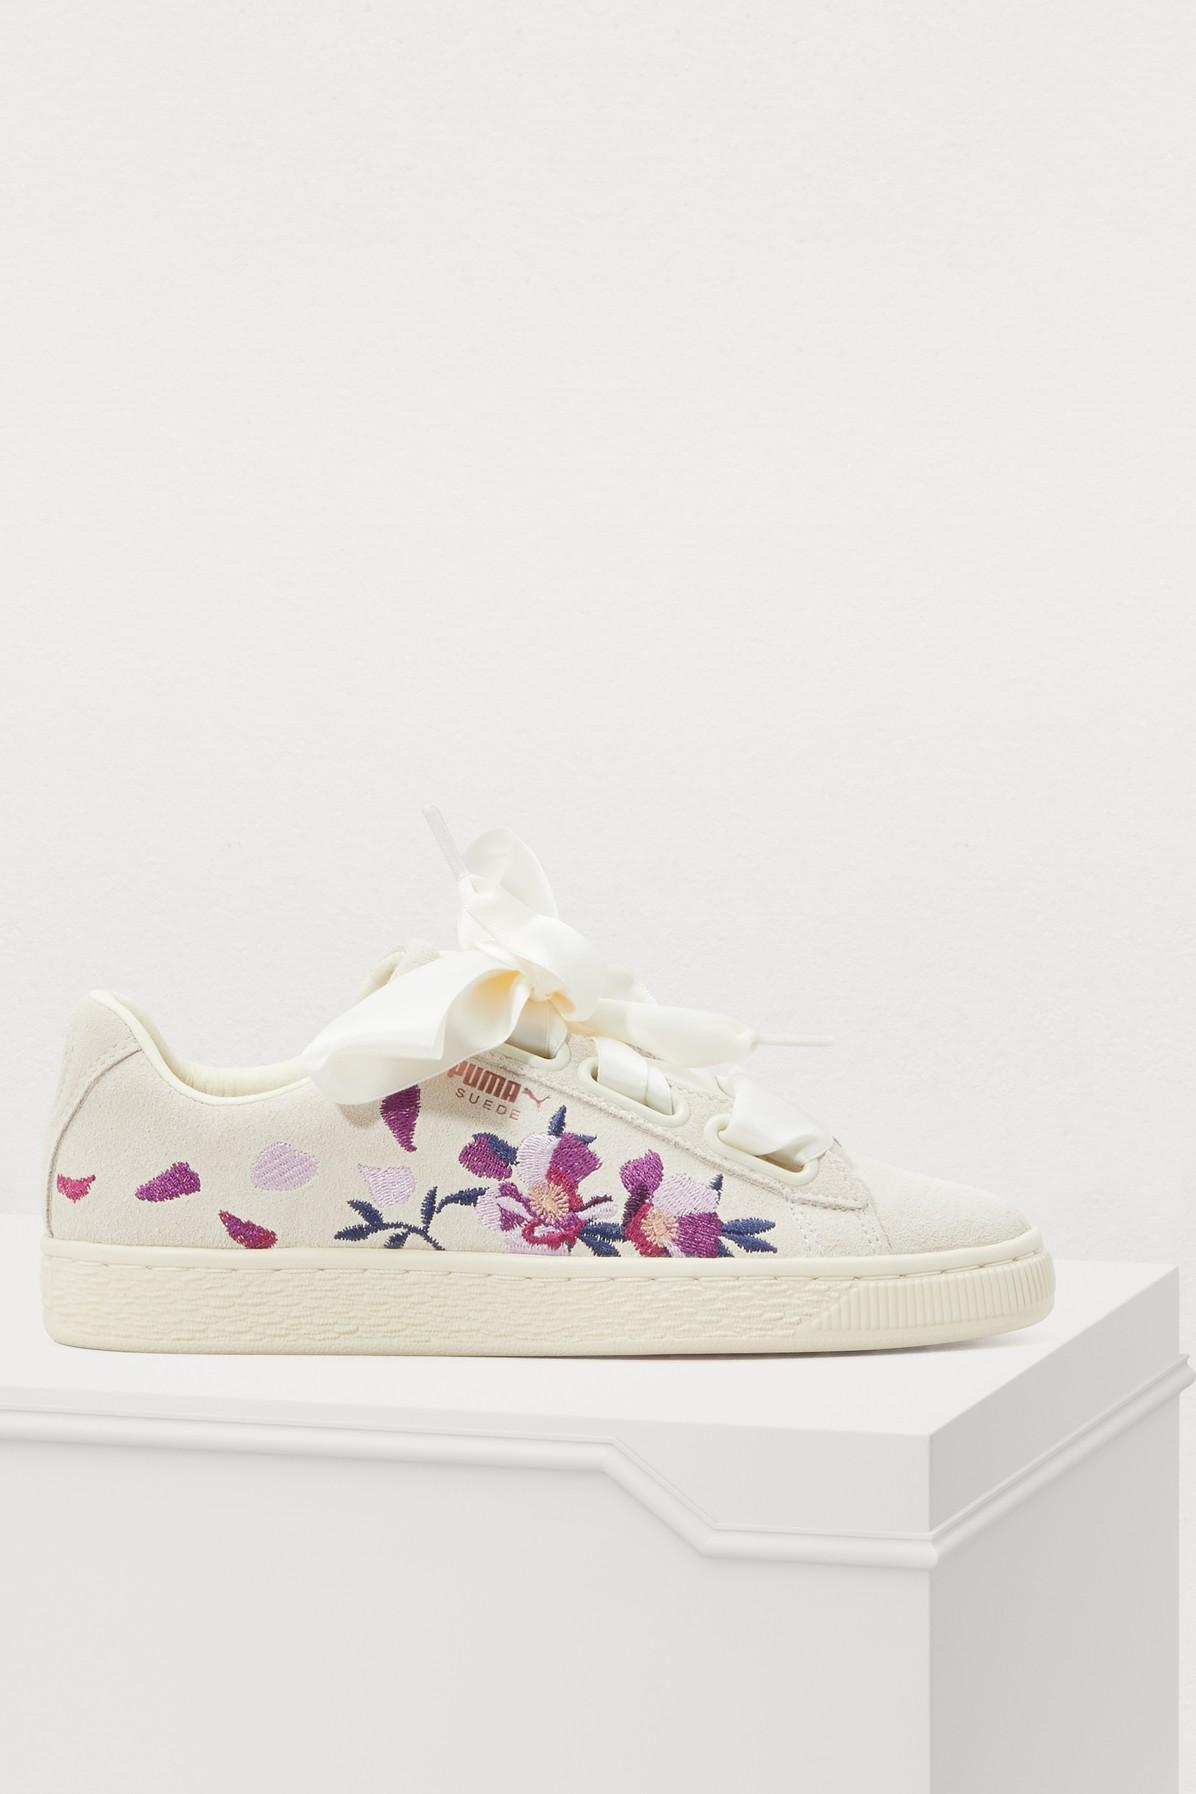 Puma Heart Flower Sneakers In White | ModeSens